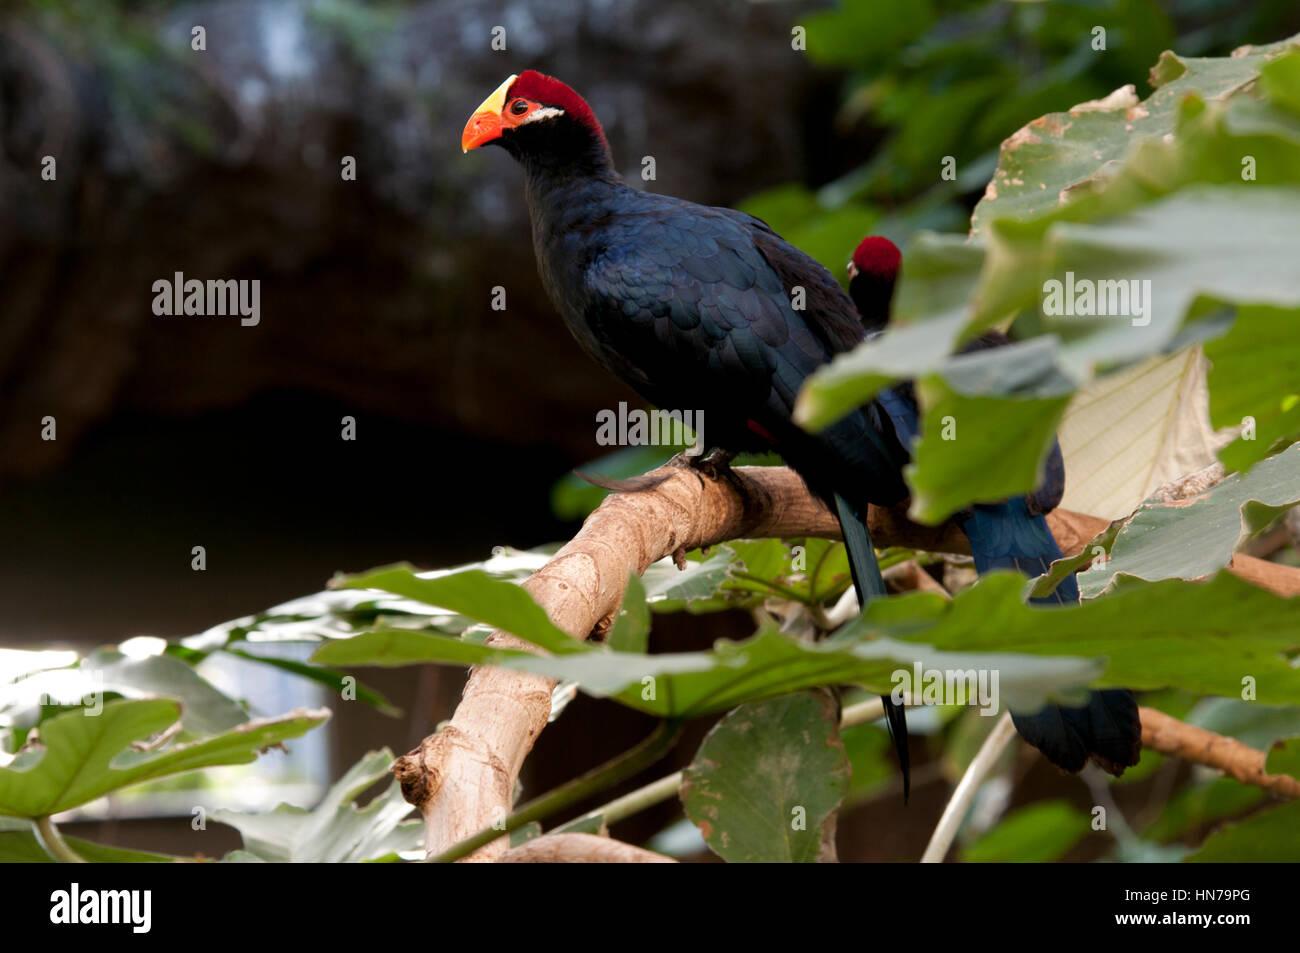 black bird with orange beak and red and yellow head stock photo